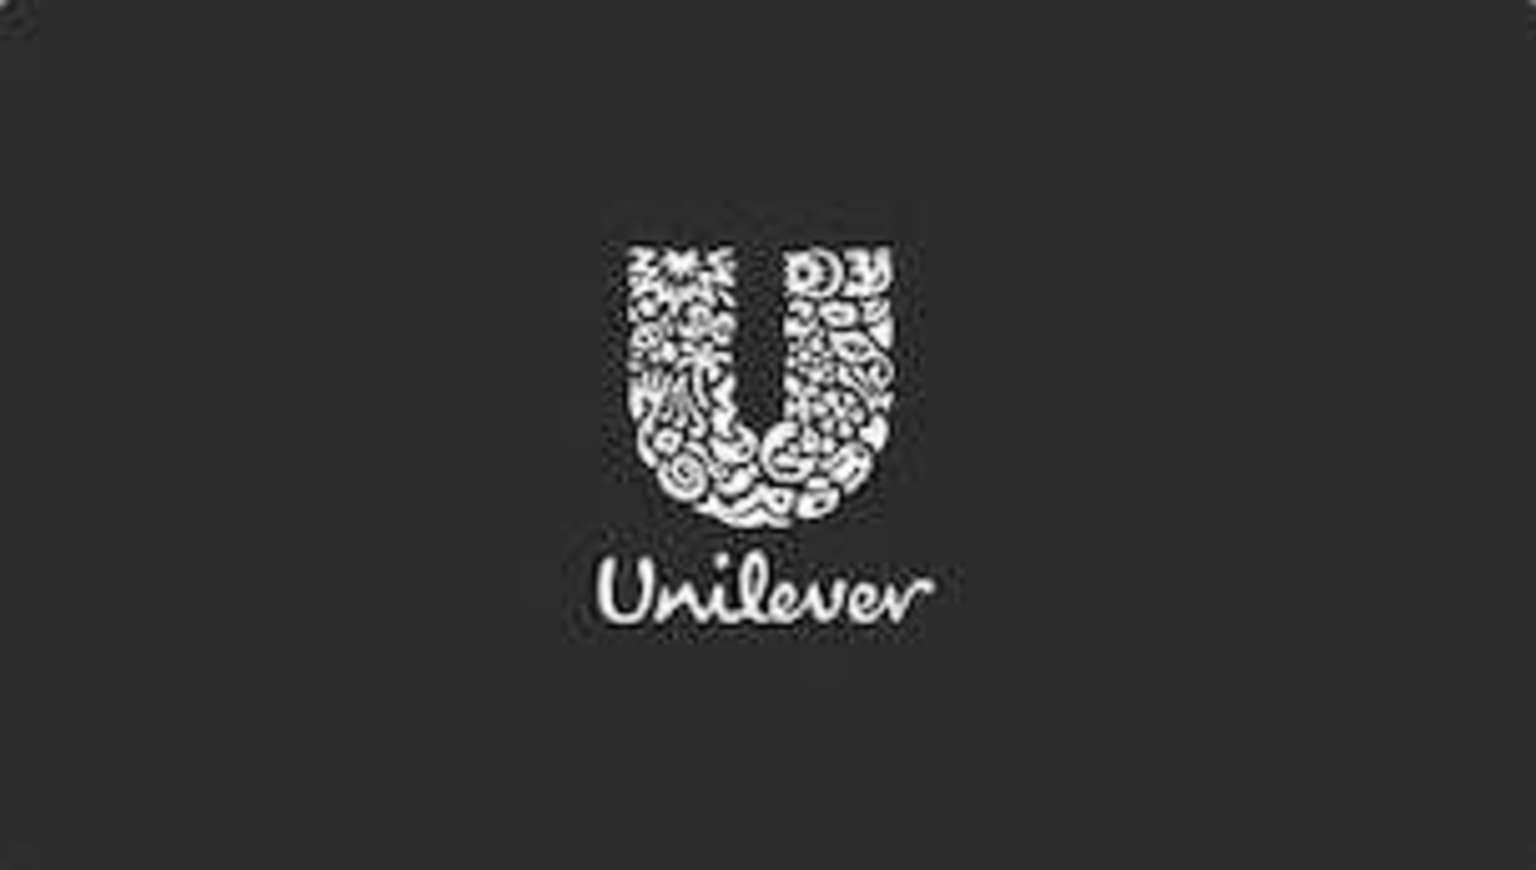 Read the Unilever customer story